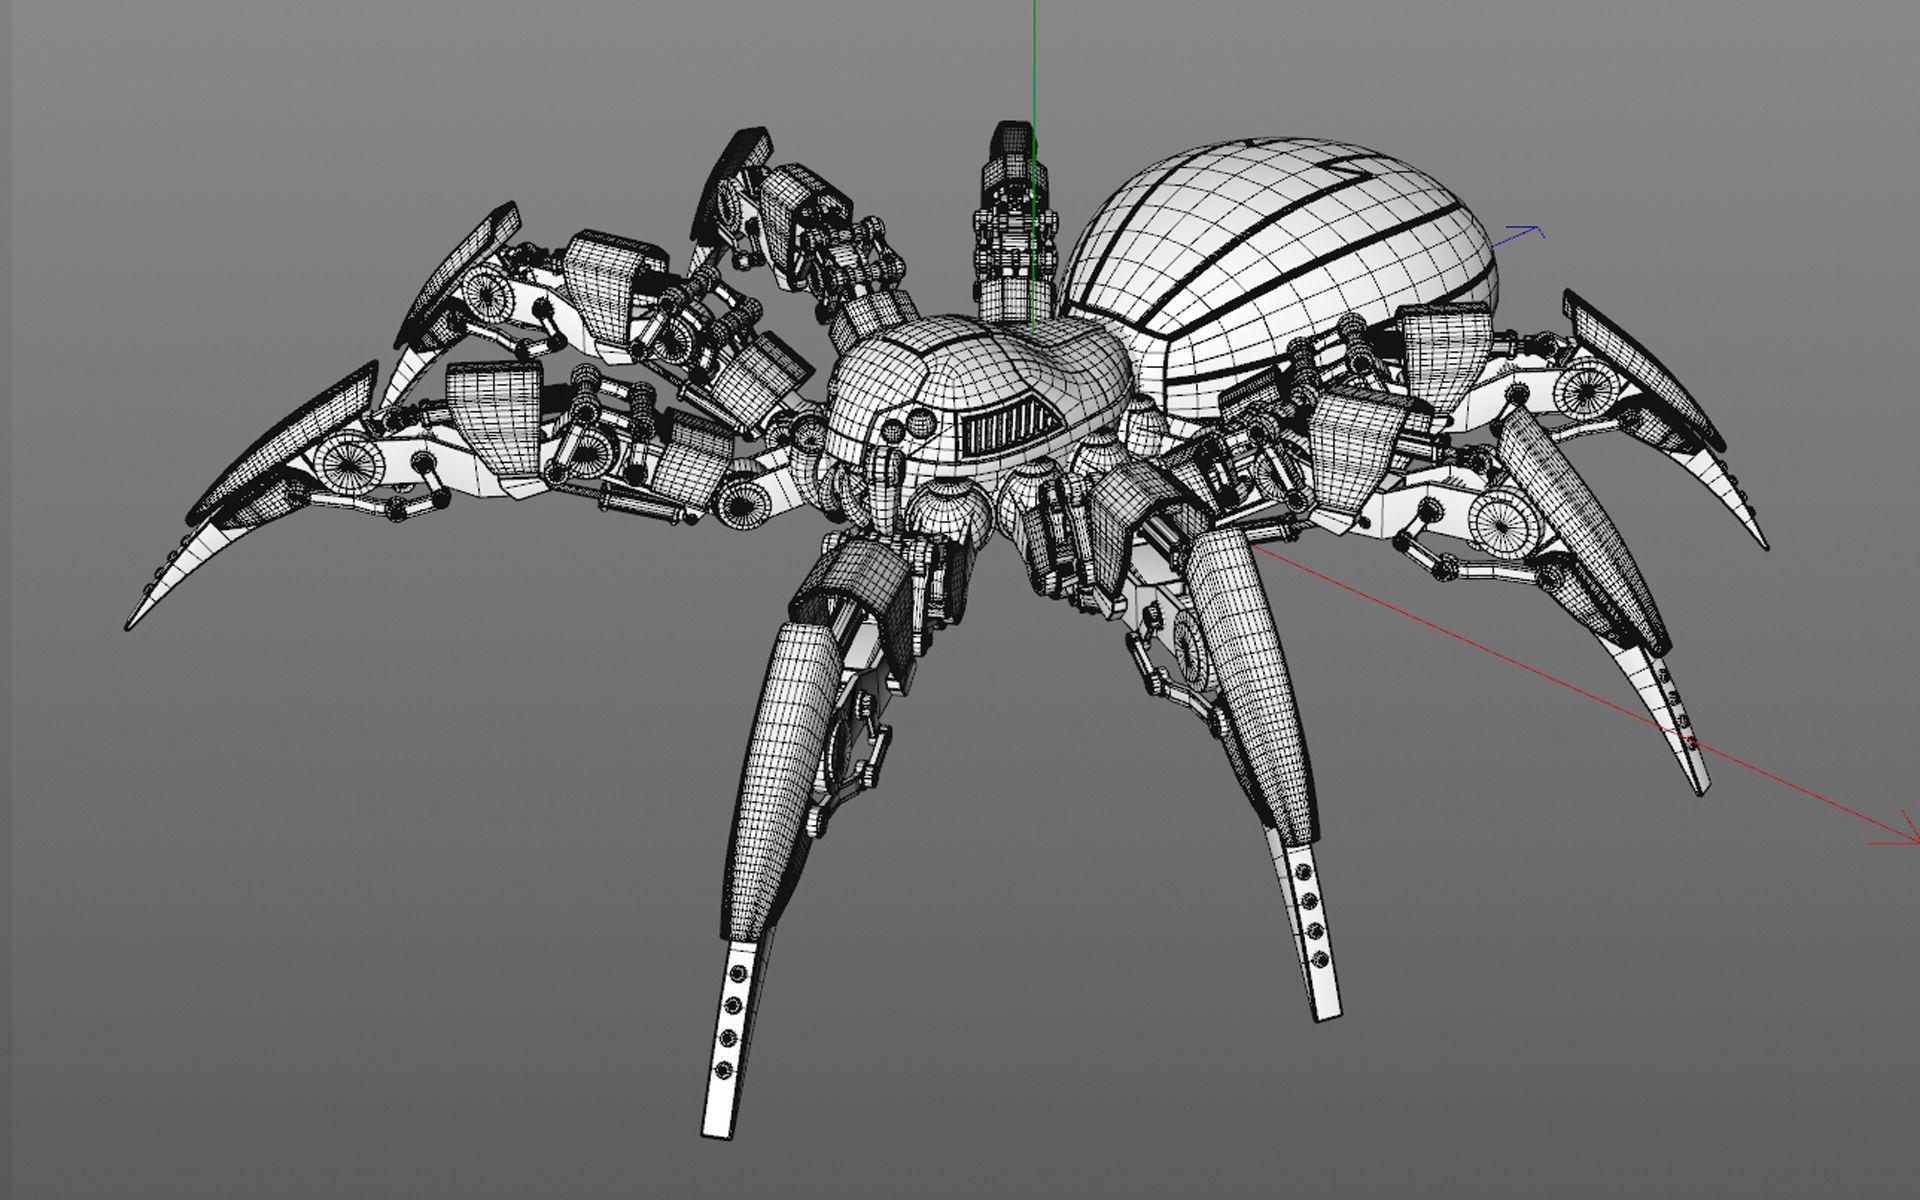 Page Full Hd P Robot Wallpapers Hd Desktop Backgrounds Spider Robot Robot Wallpaper Robot Design